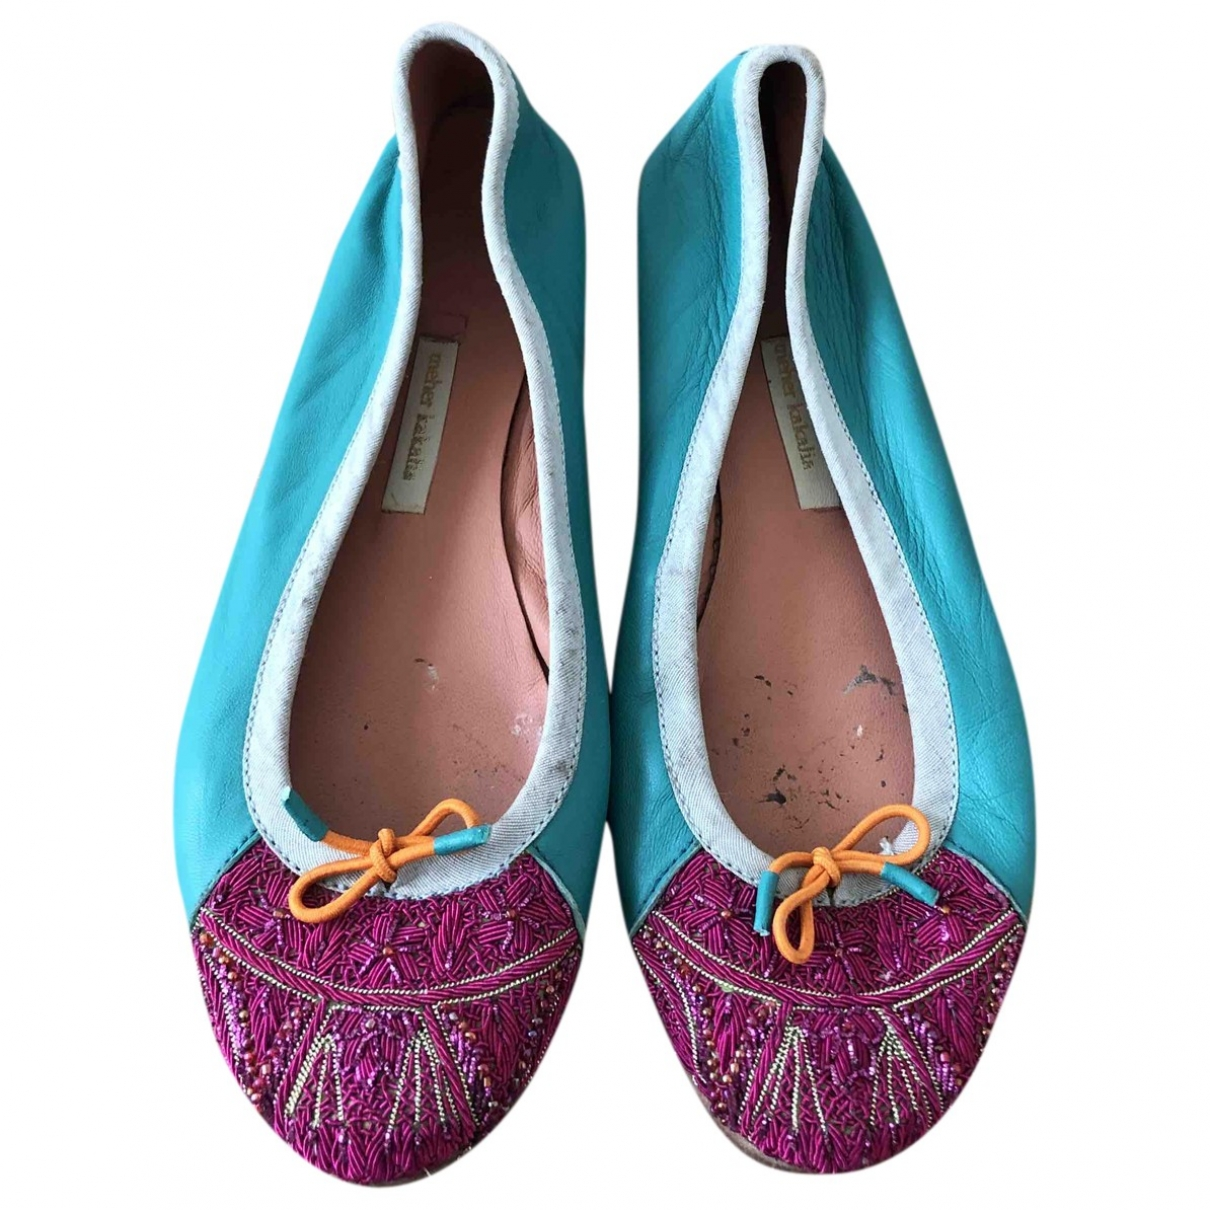 Meher Kakalia - Ballerines   pour femme en cuir - turquoise